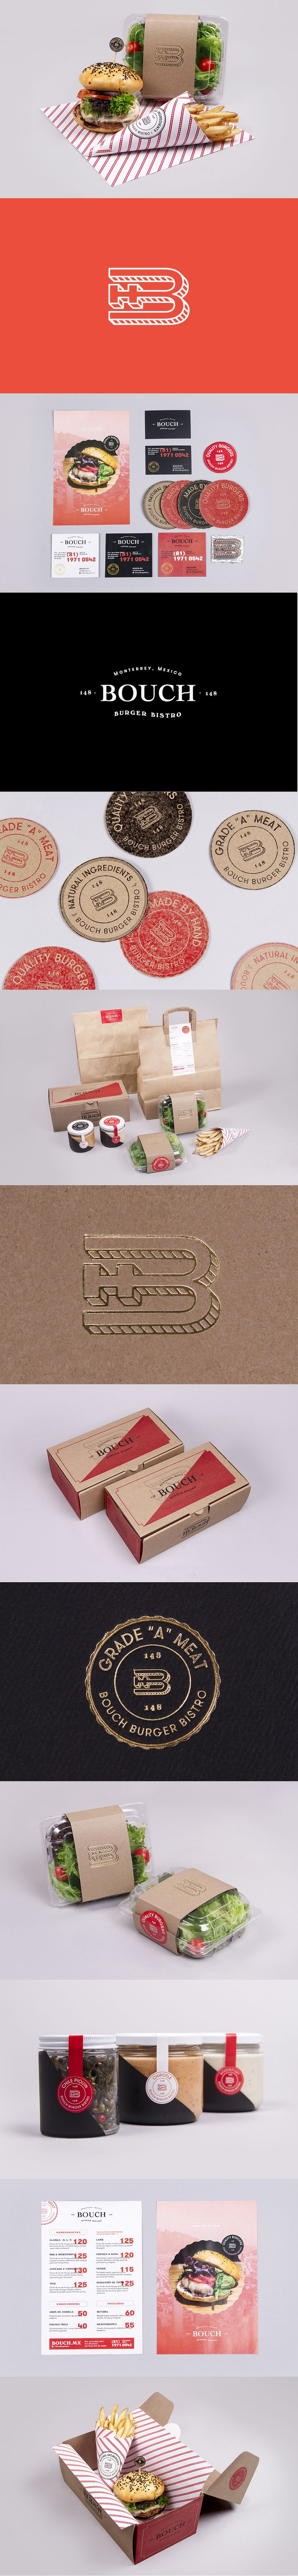 Package design food burger logo icon type flyer bags menu box vintage restaurant